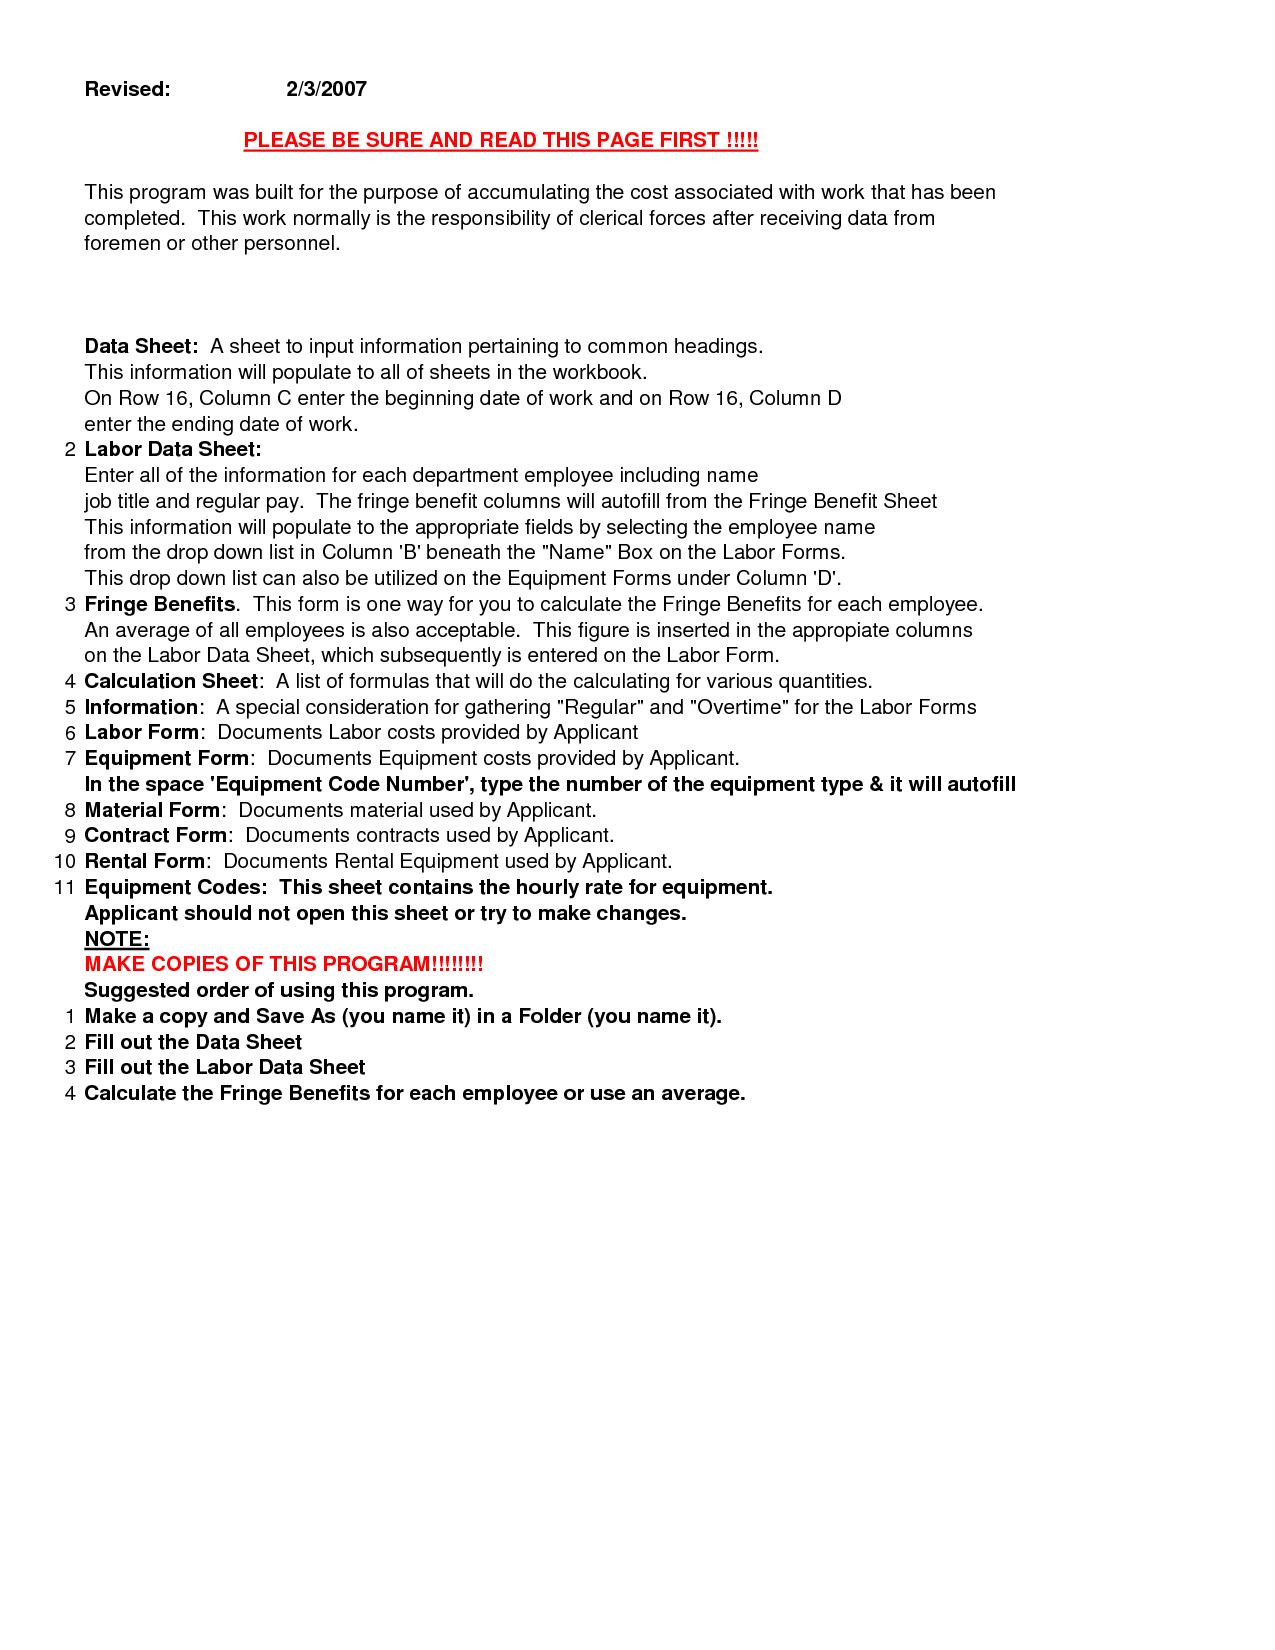 fema fringe benefits calculation worksheetFEMA PA Excel Forms Workbook crKGaBHr